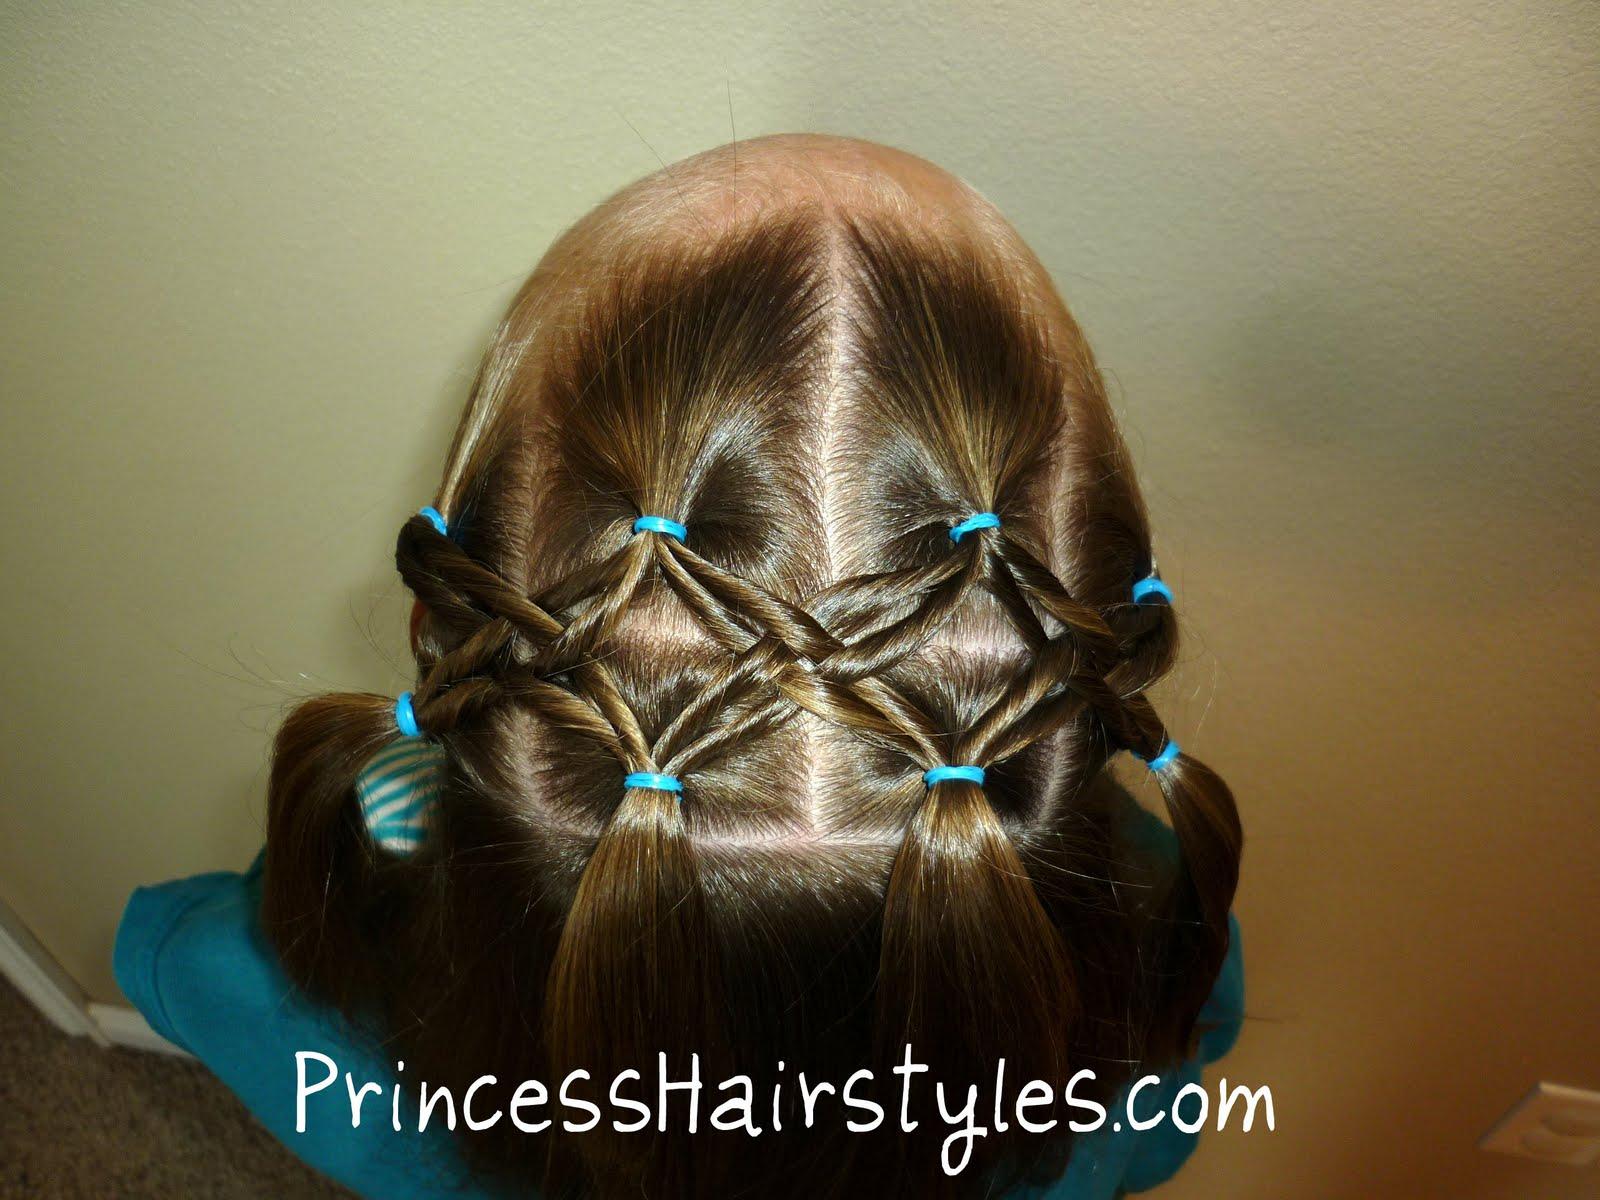 Phenomenal Woven Hair Headband Hairstyles For Girls Princess Hairstyles Hairstyles For Women Draintrainus